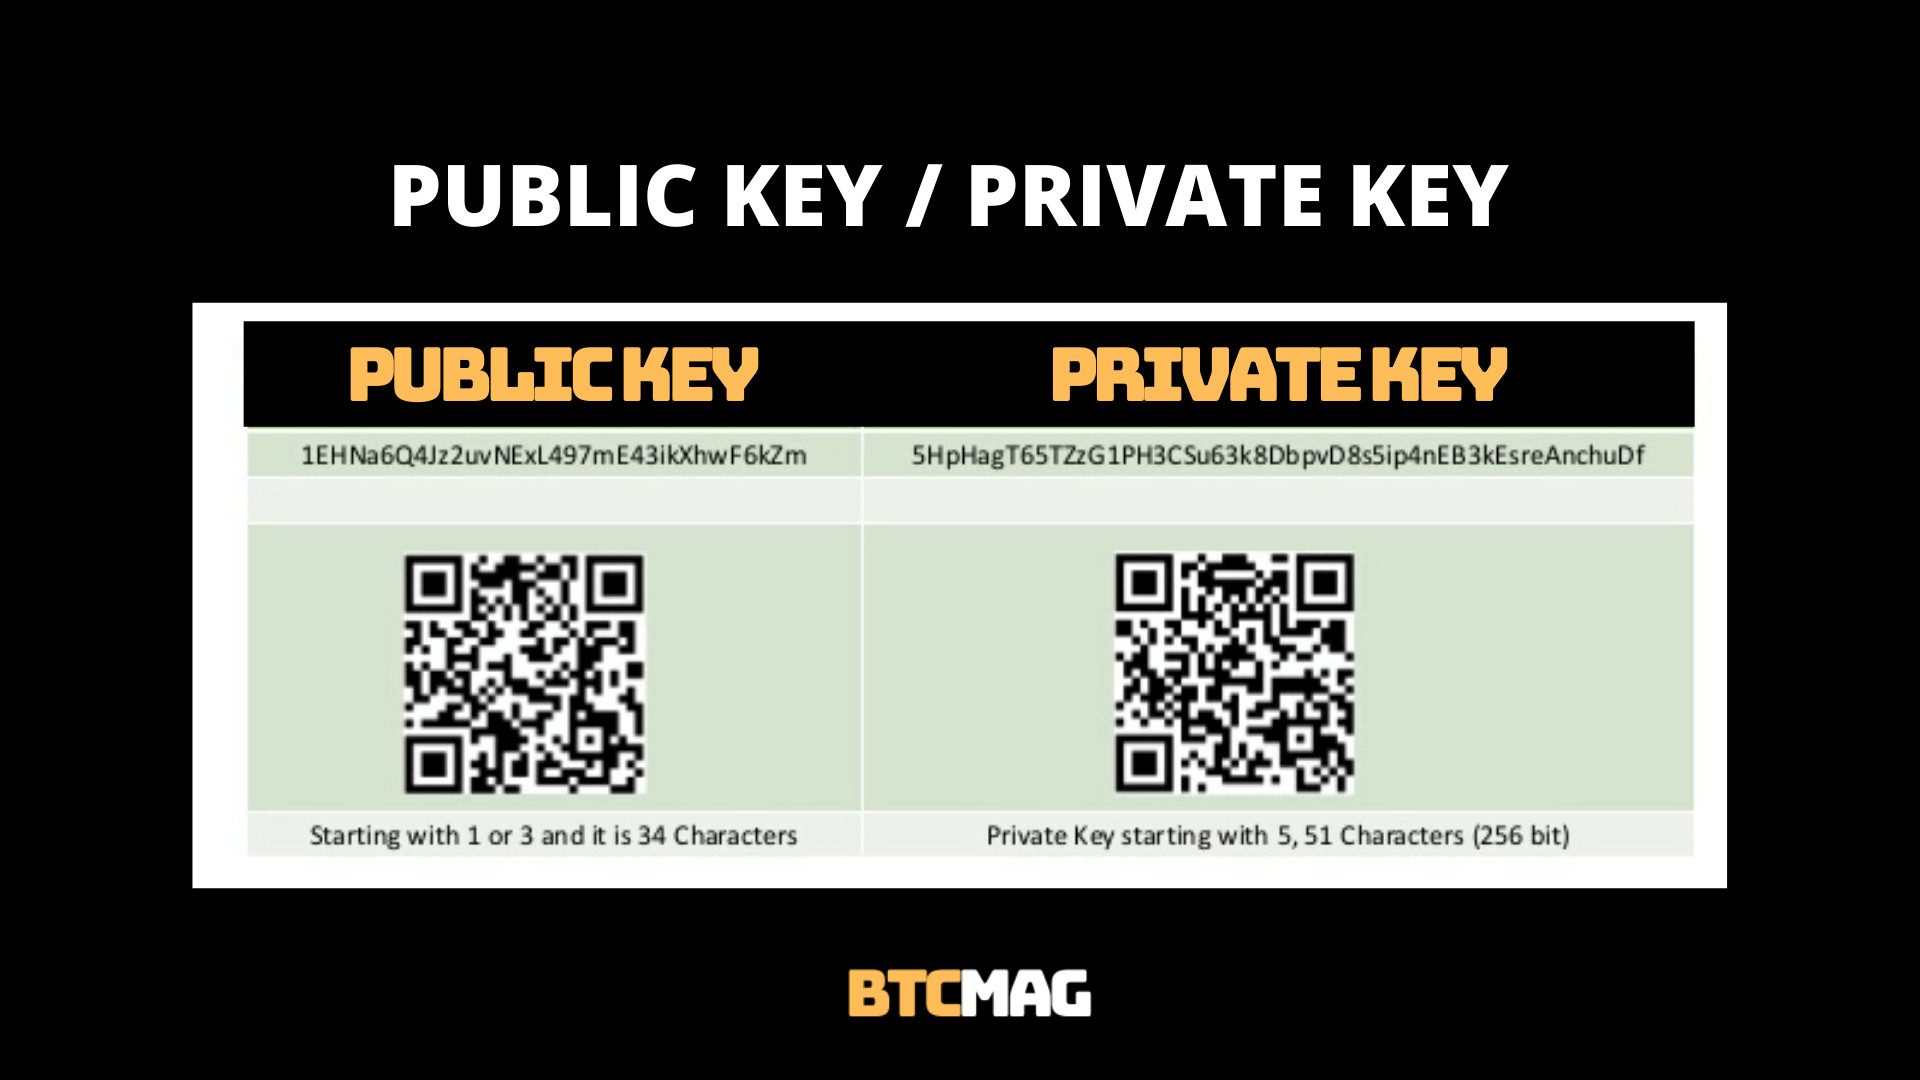 public key / private key